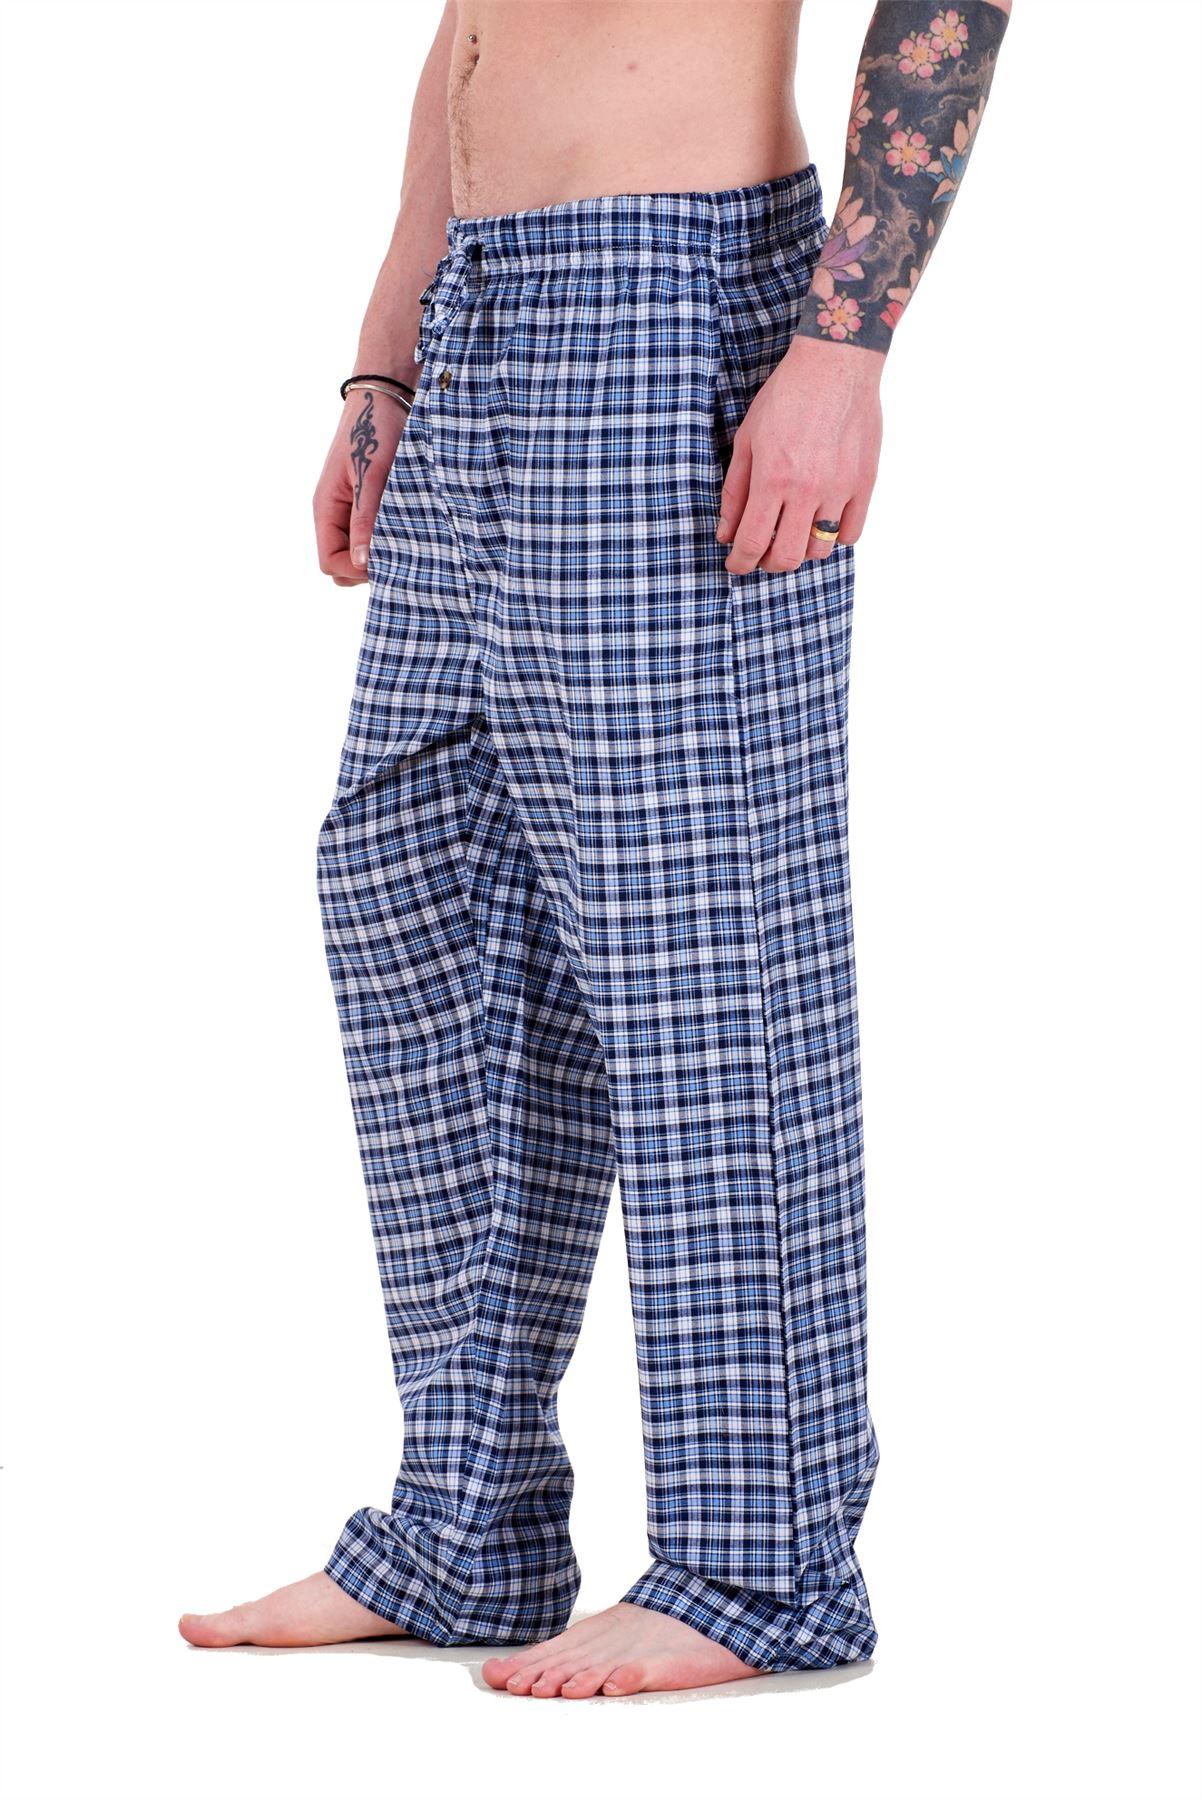 Mens-Pyjama-Bottoms-Rich-Cotton-Woven-Check-Lounge-Pant-Nightwear-Big-3XL-to-5XL Indexbild 14